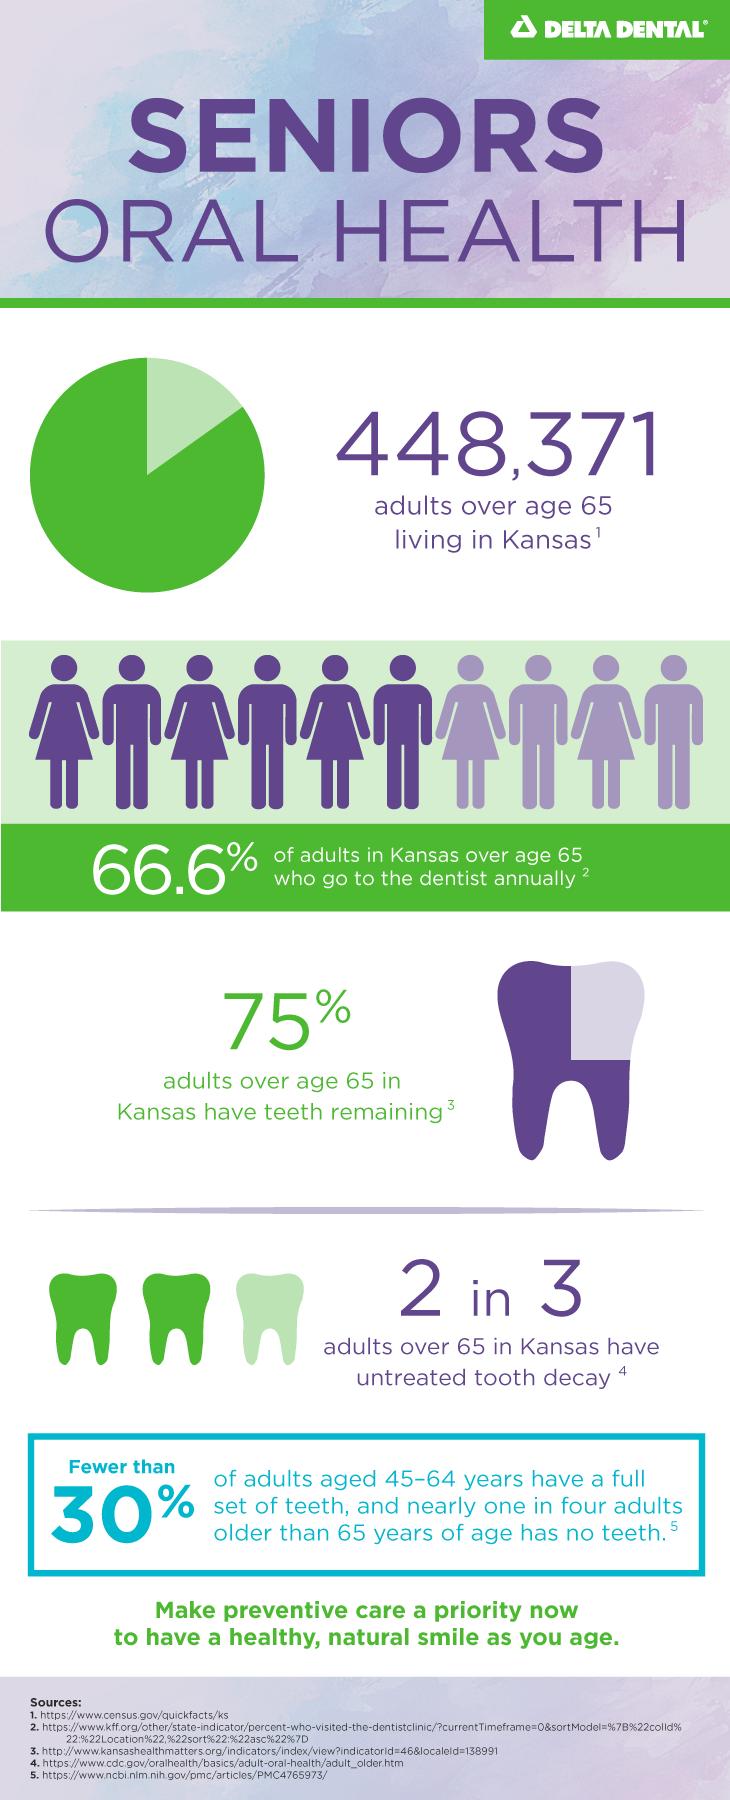 Seniors oral health infographic